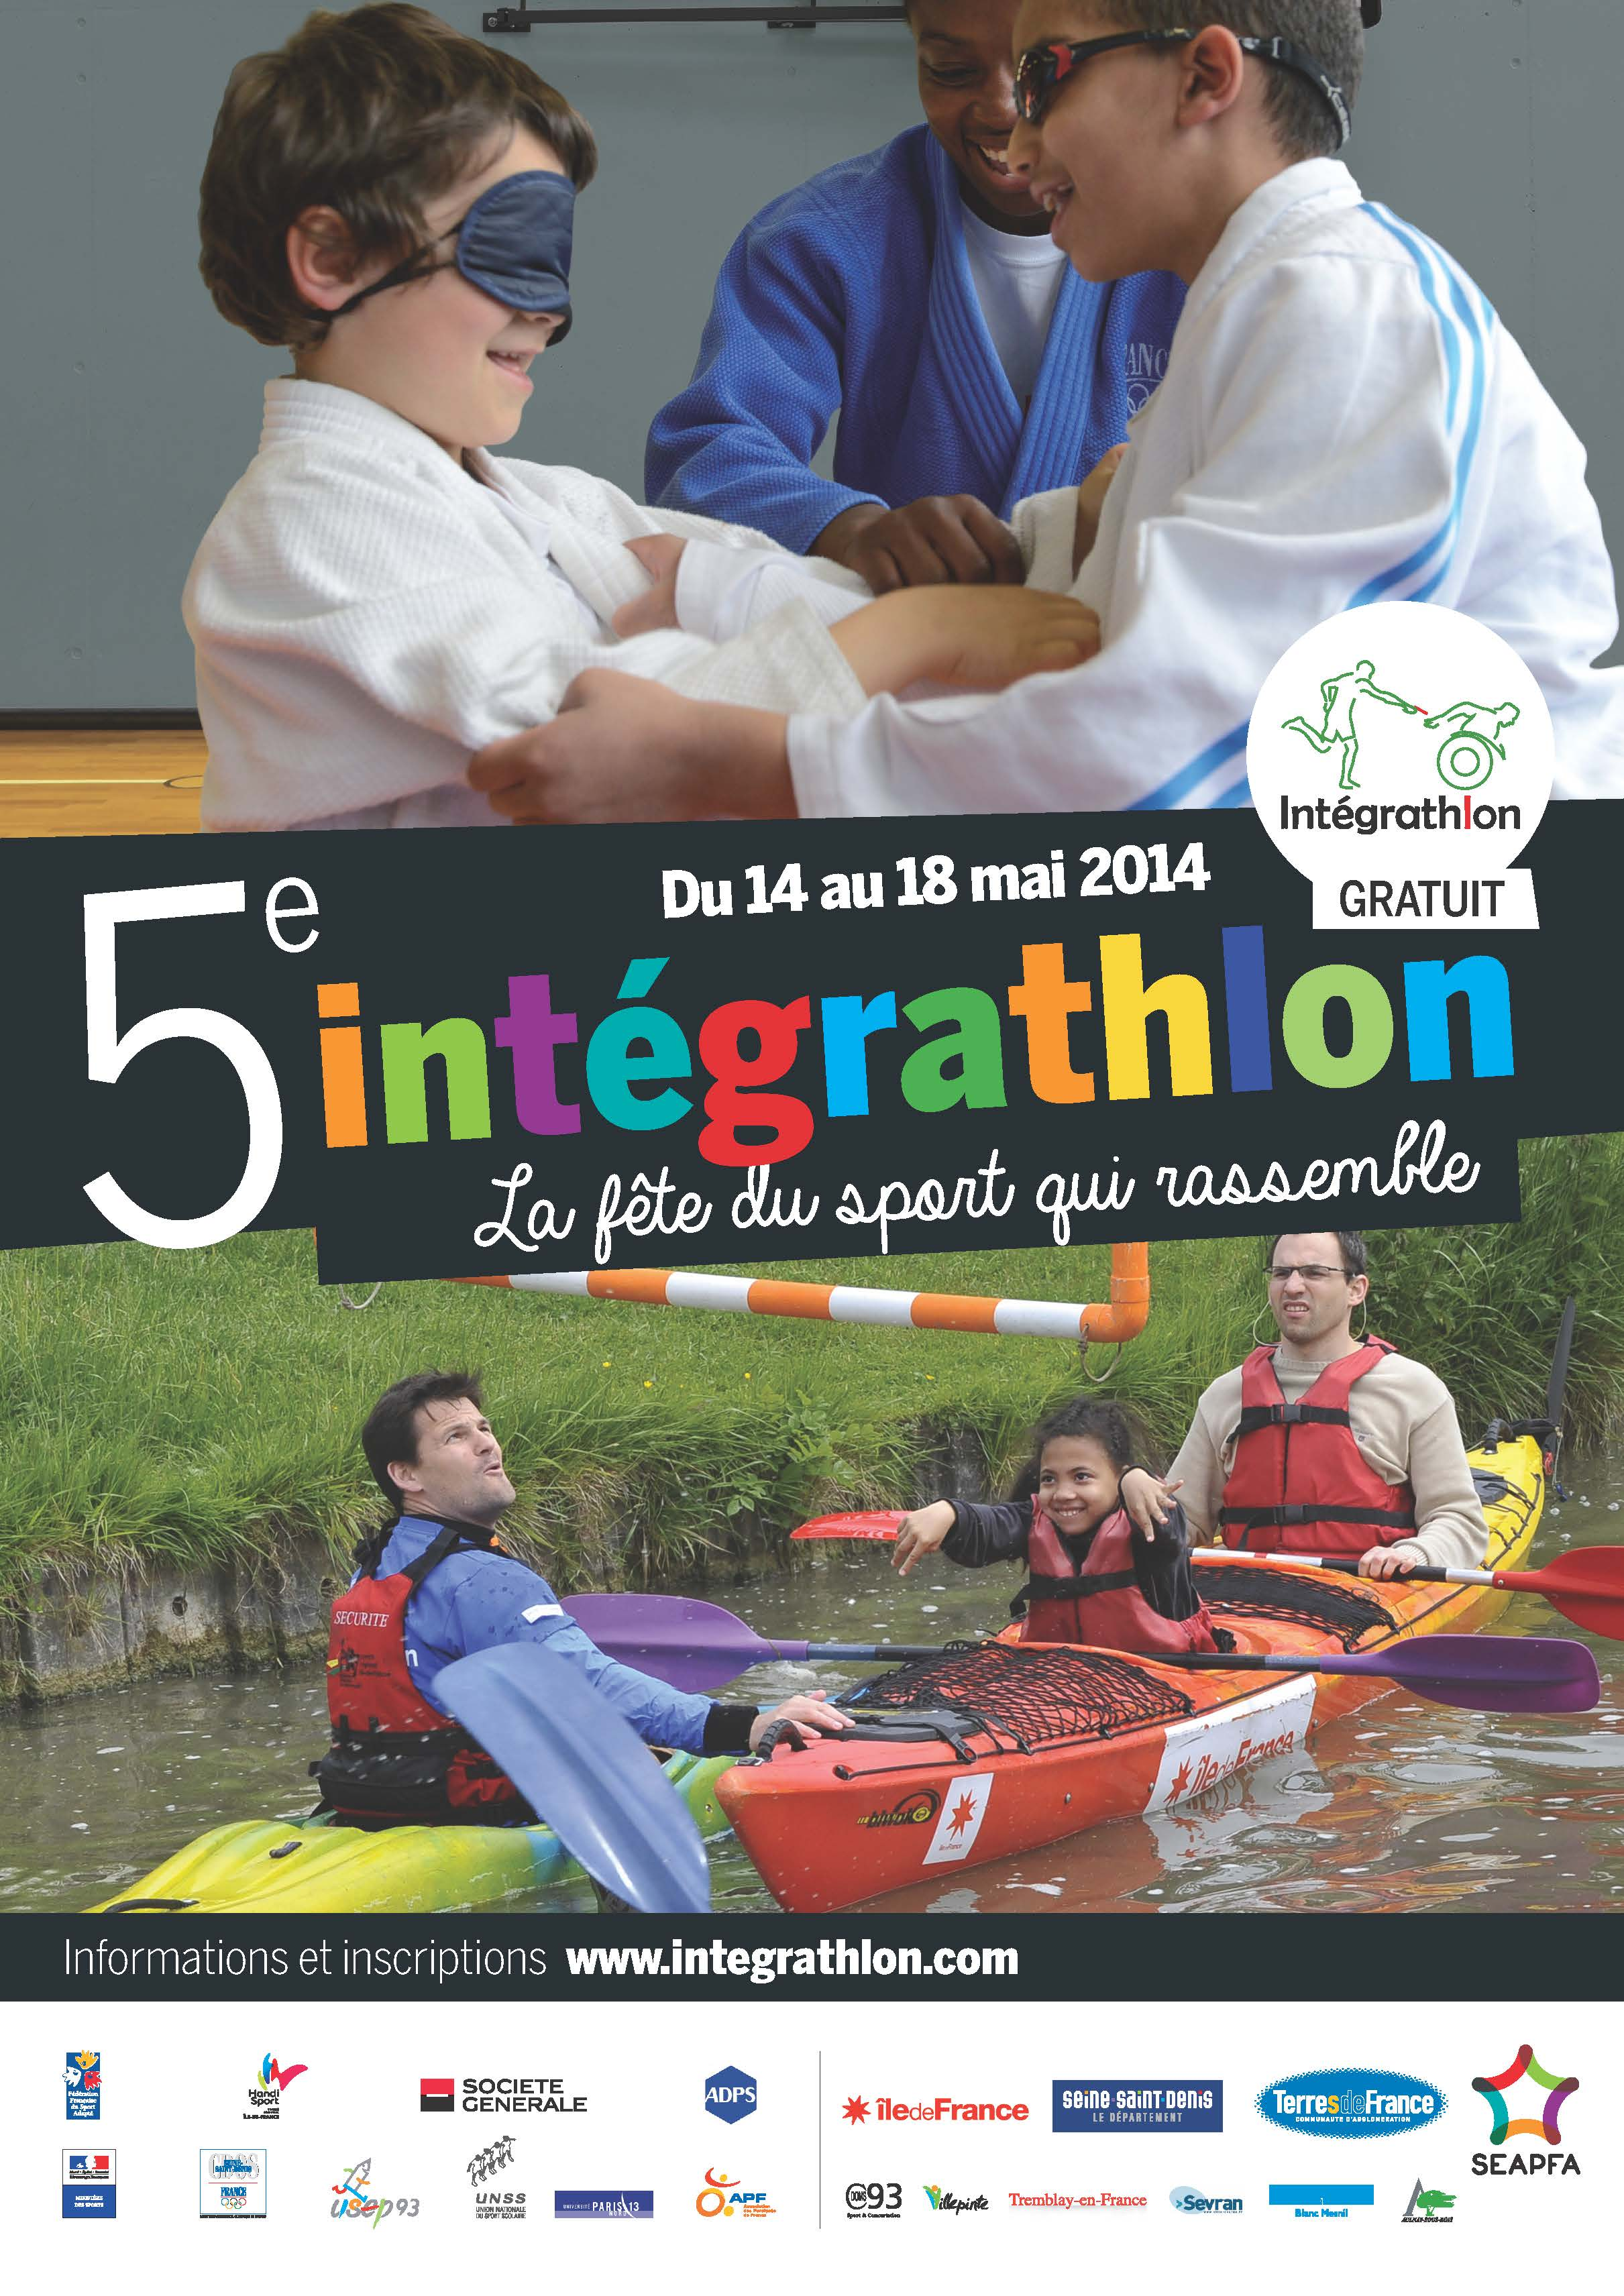 Week-end du 17 au 18 Mai 2014 – Intégrathlon 2014